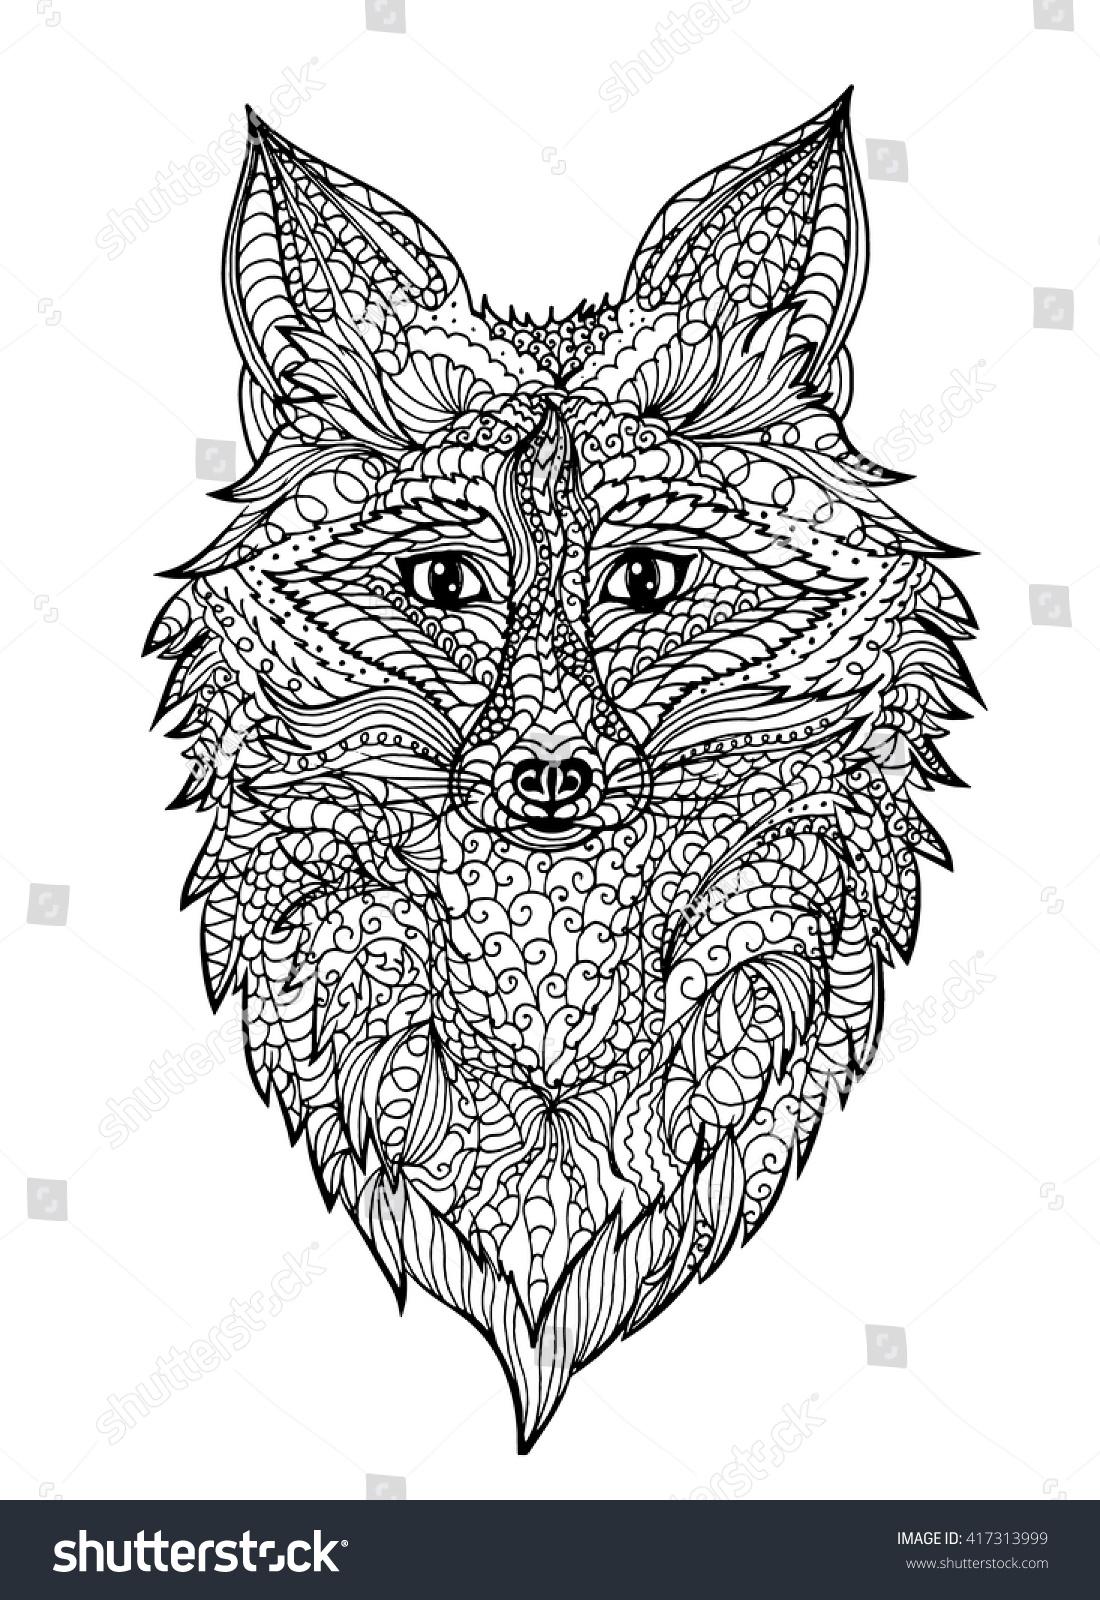 Zentangle Fox Coloring Pagetattoo T Shirt Stock Vector